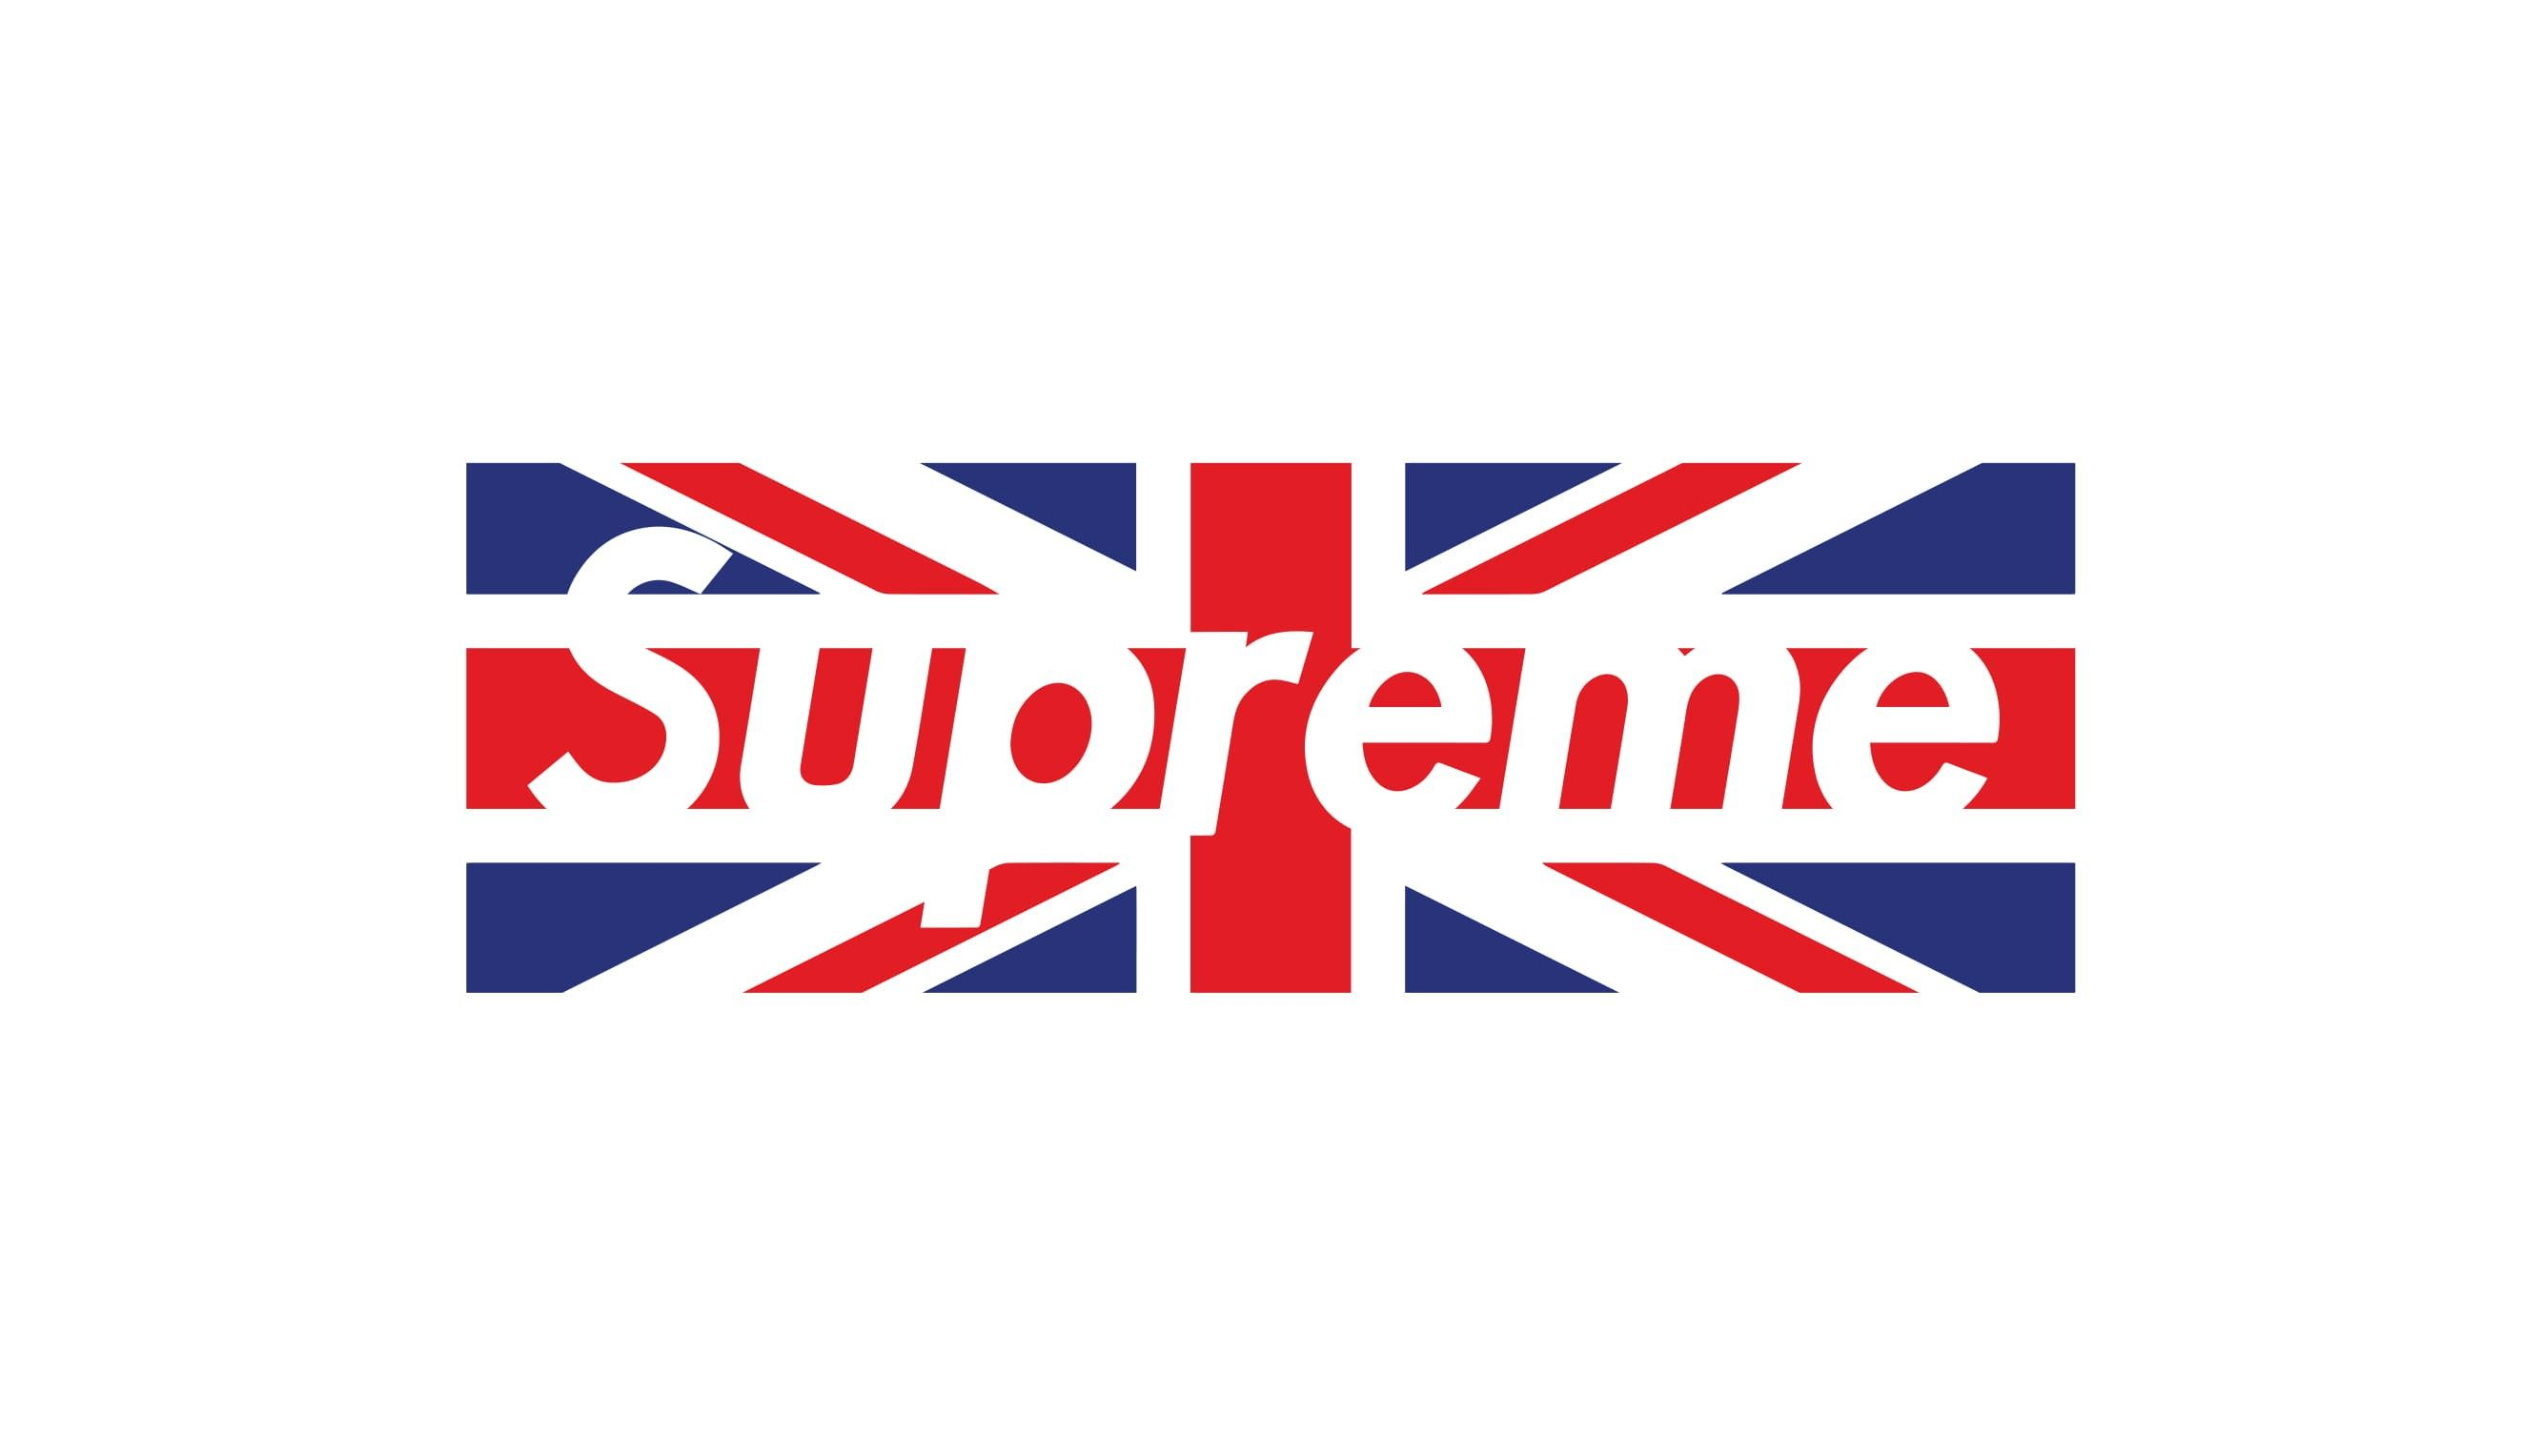 Supreme Box Logo Wallpapers On Wallpaperdog